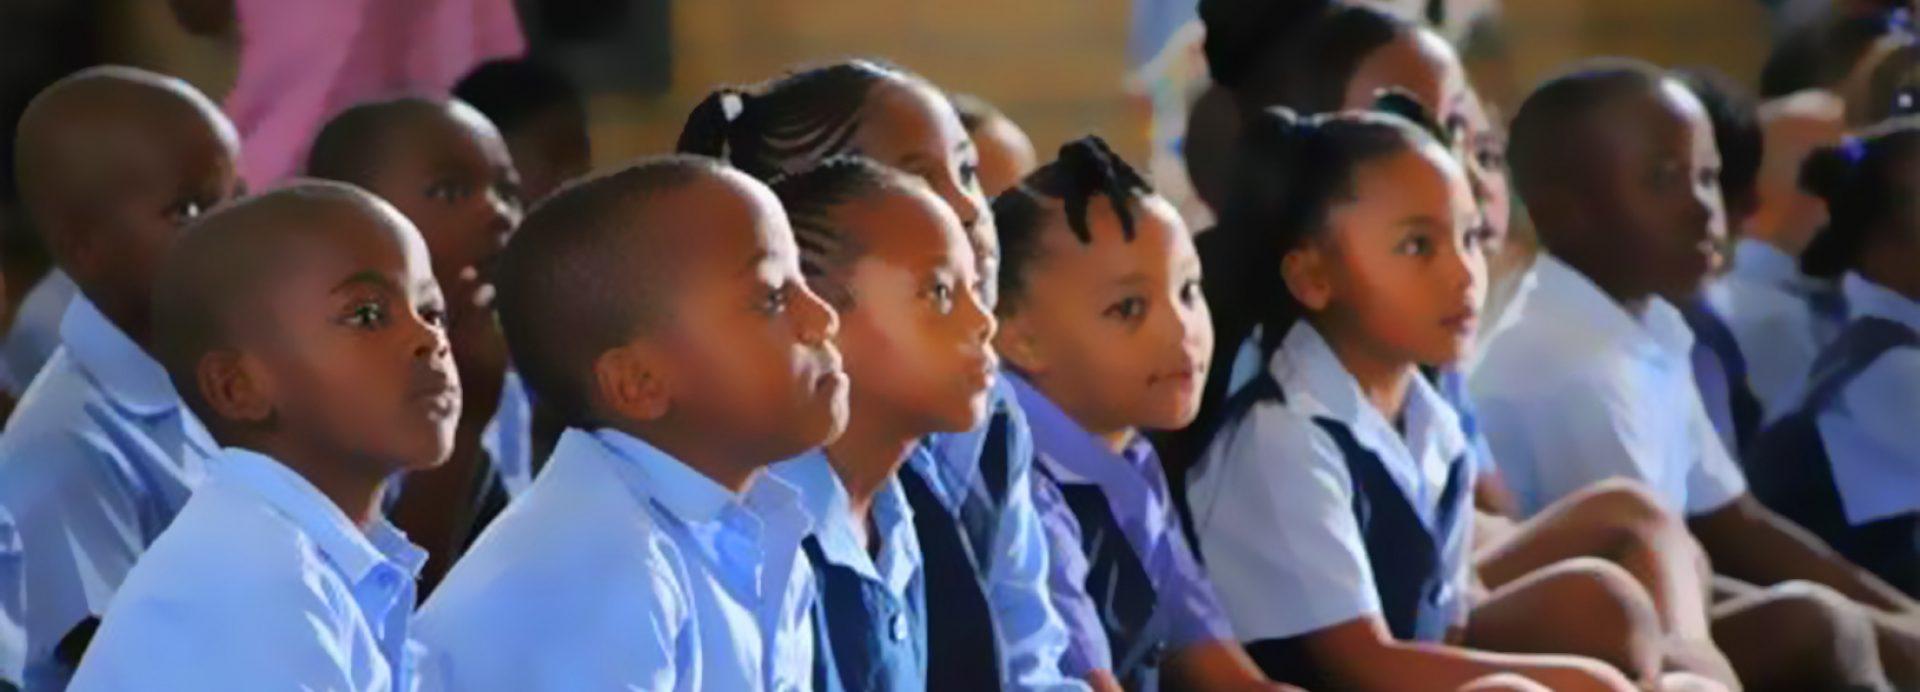 Townsview Primary School